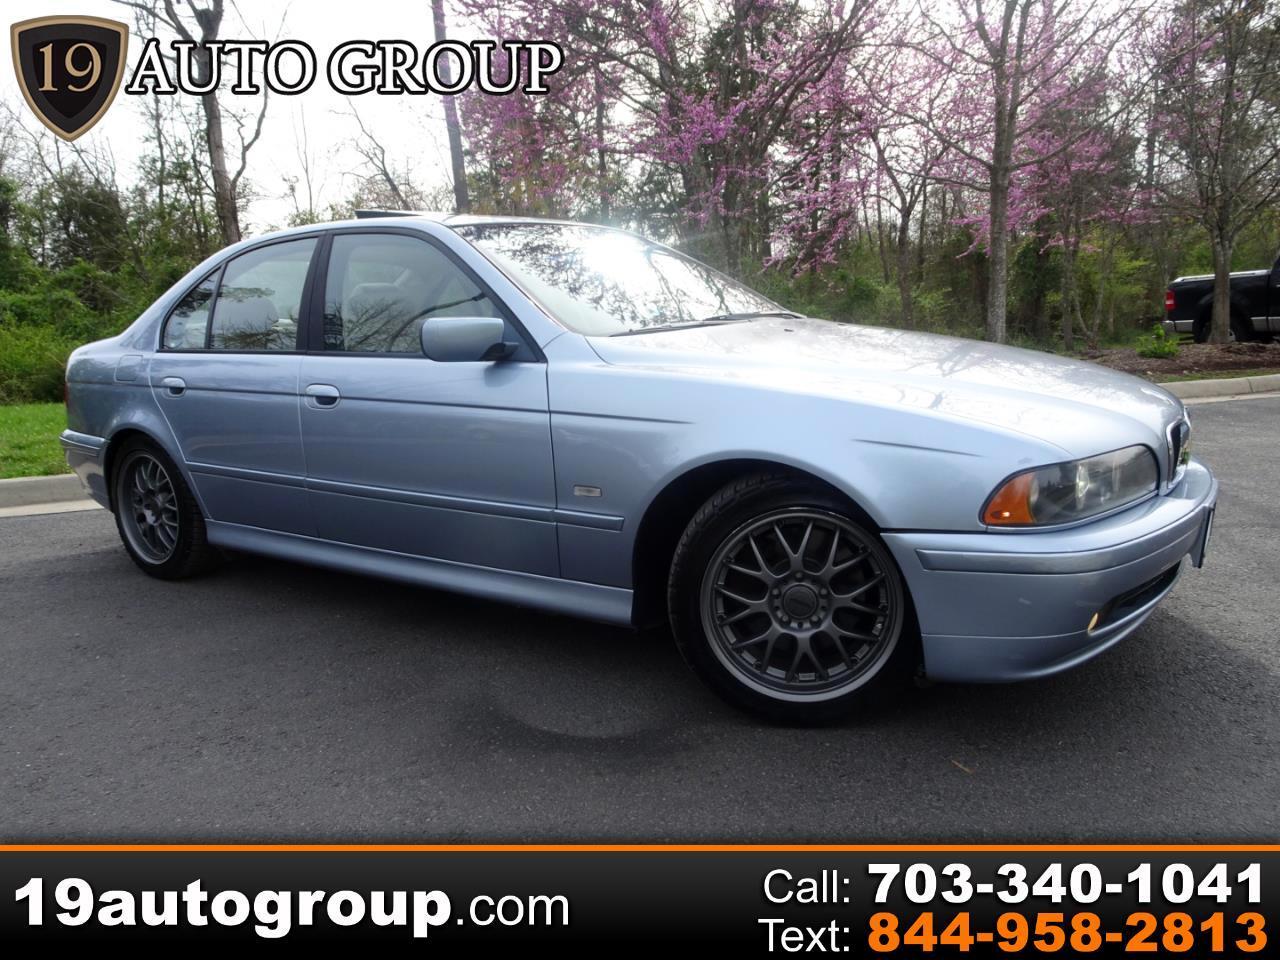 BMW 5-Series 530i 2003